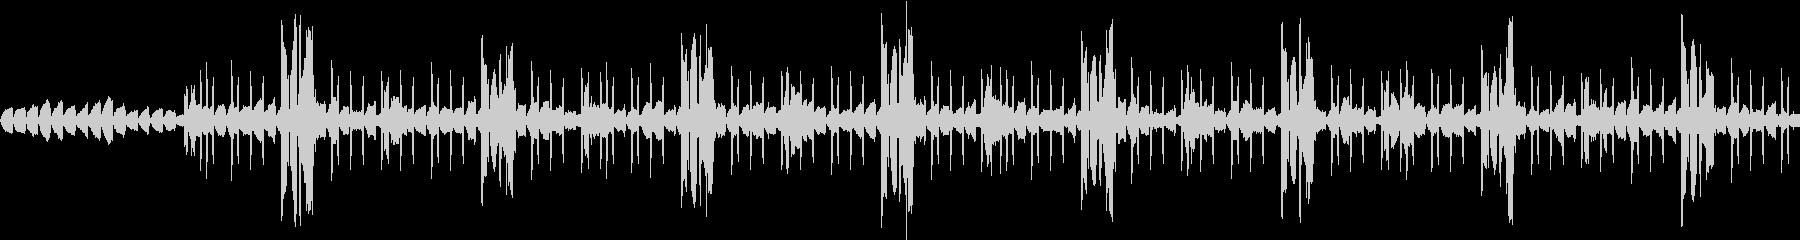 Lofi musicの未再生の波形